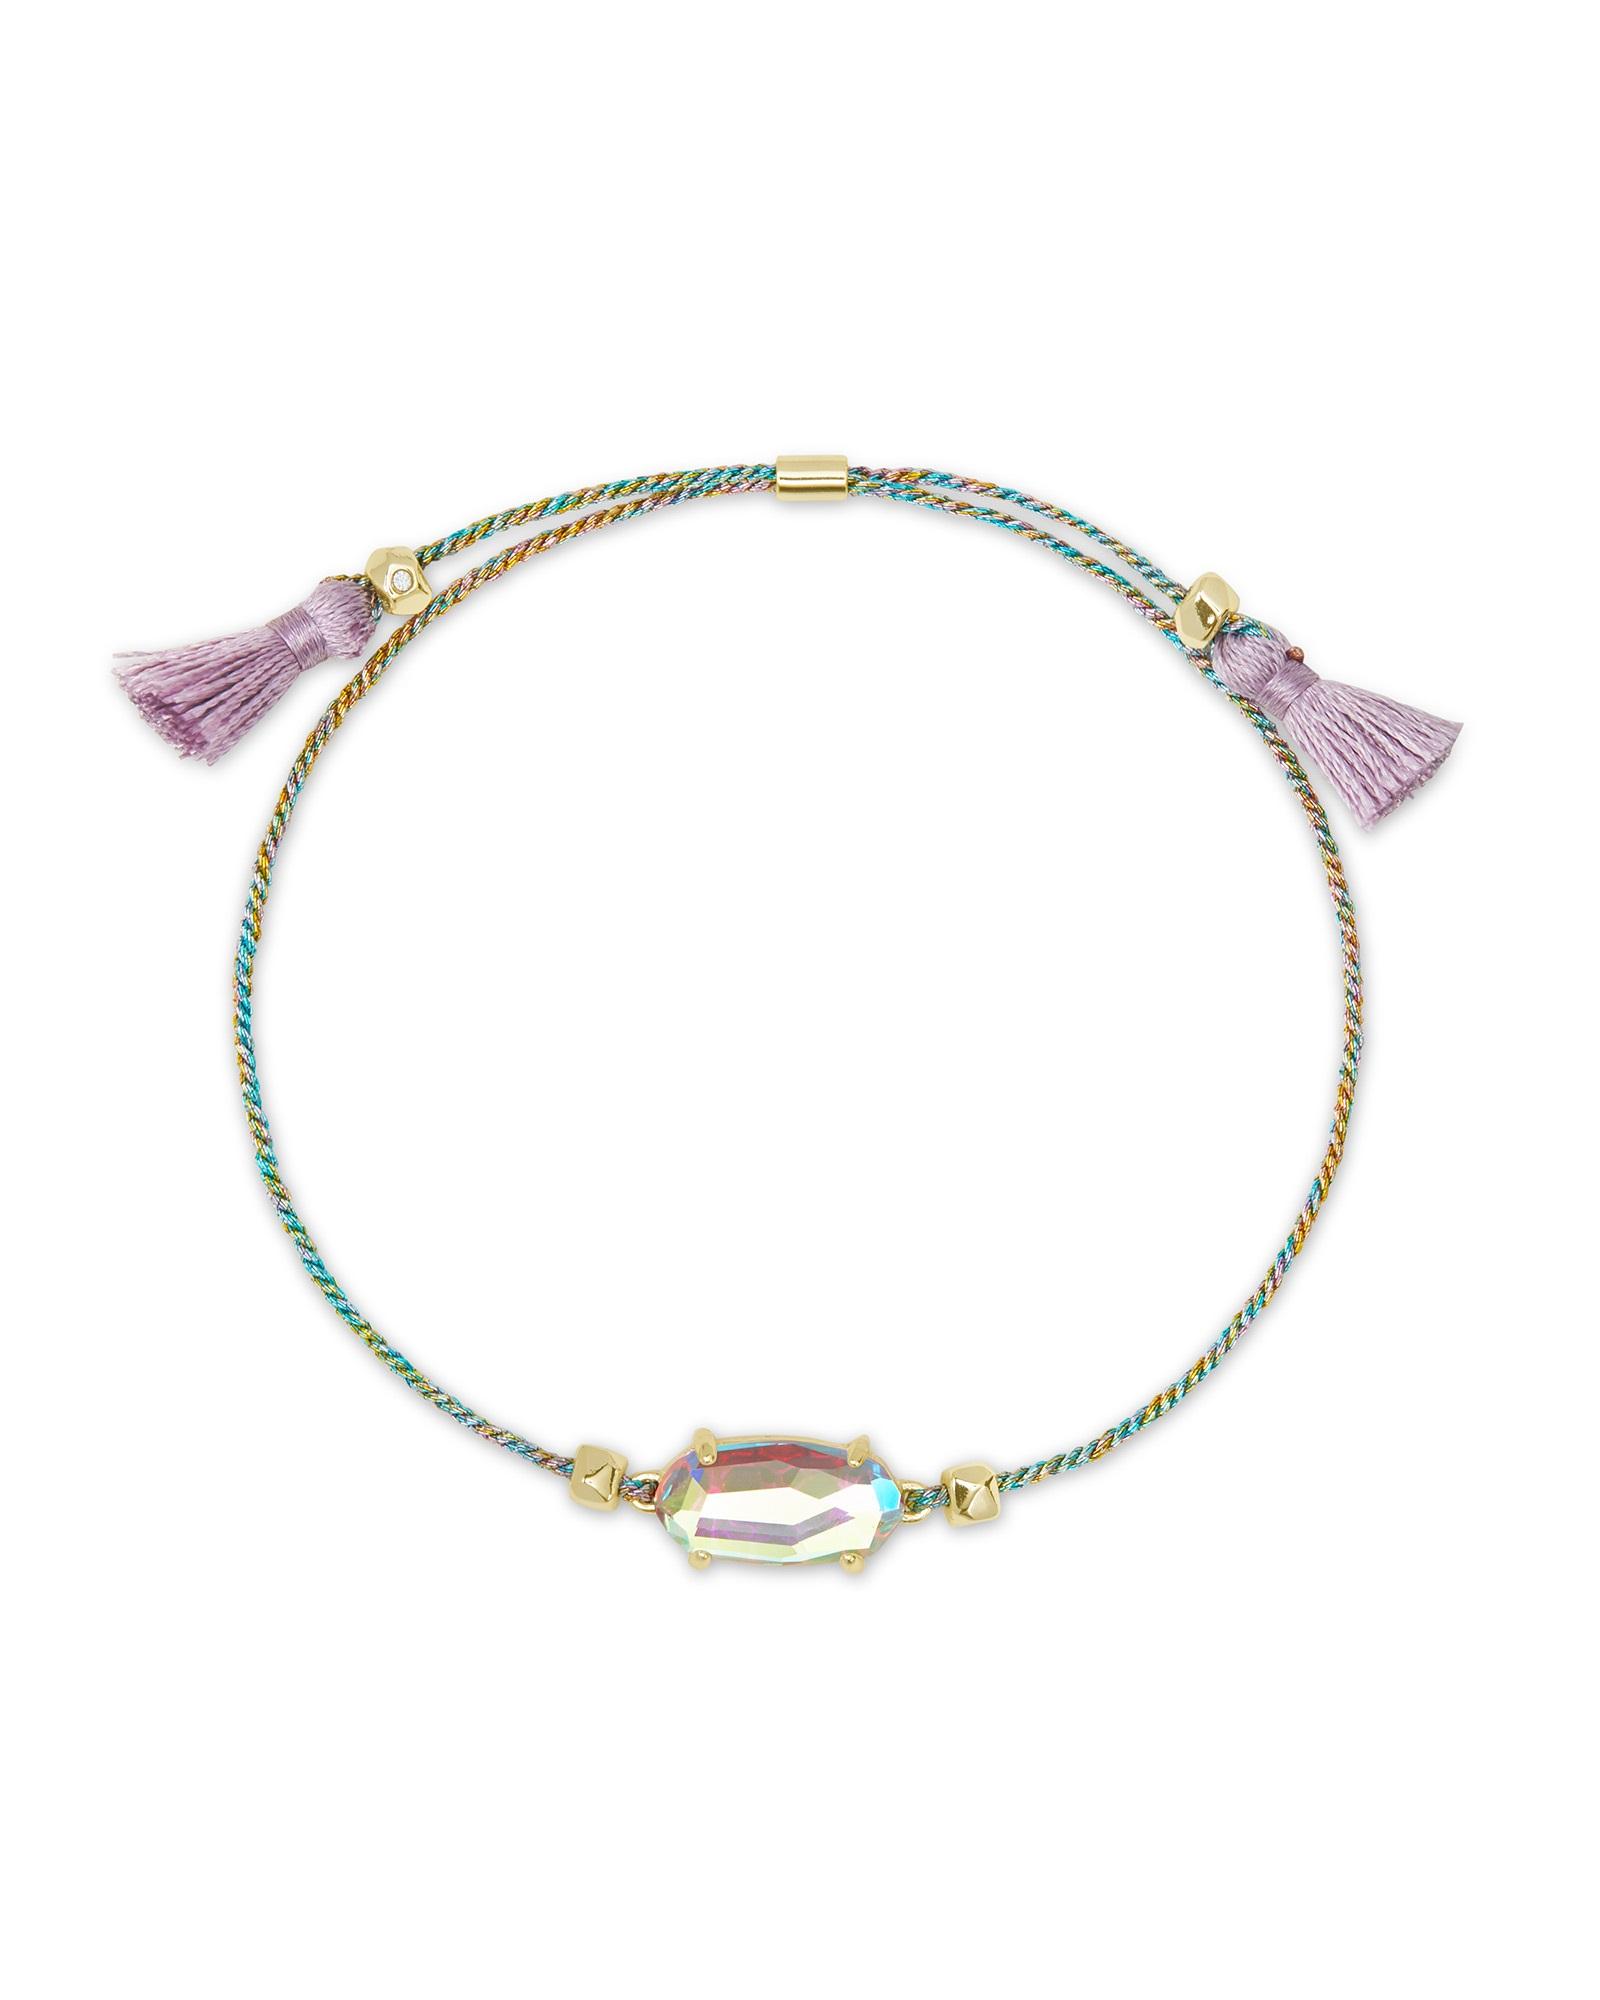 kendra scott friendship bracelet, proceeds to feeding america coronavirus fund